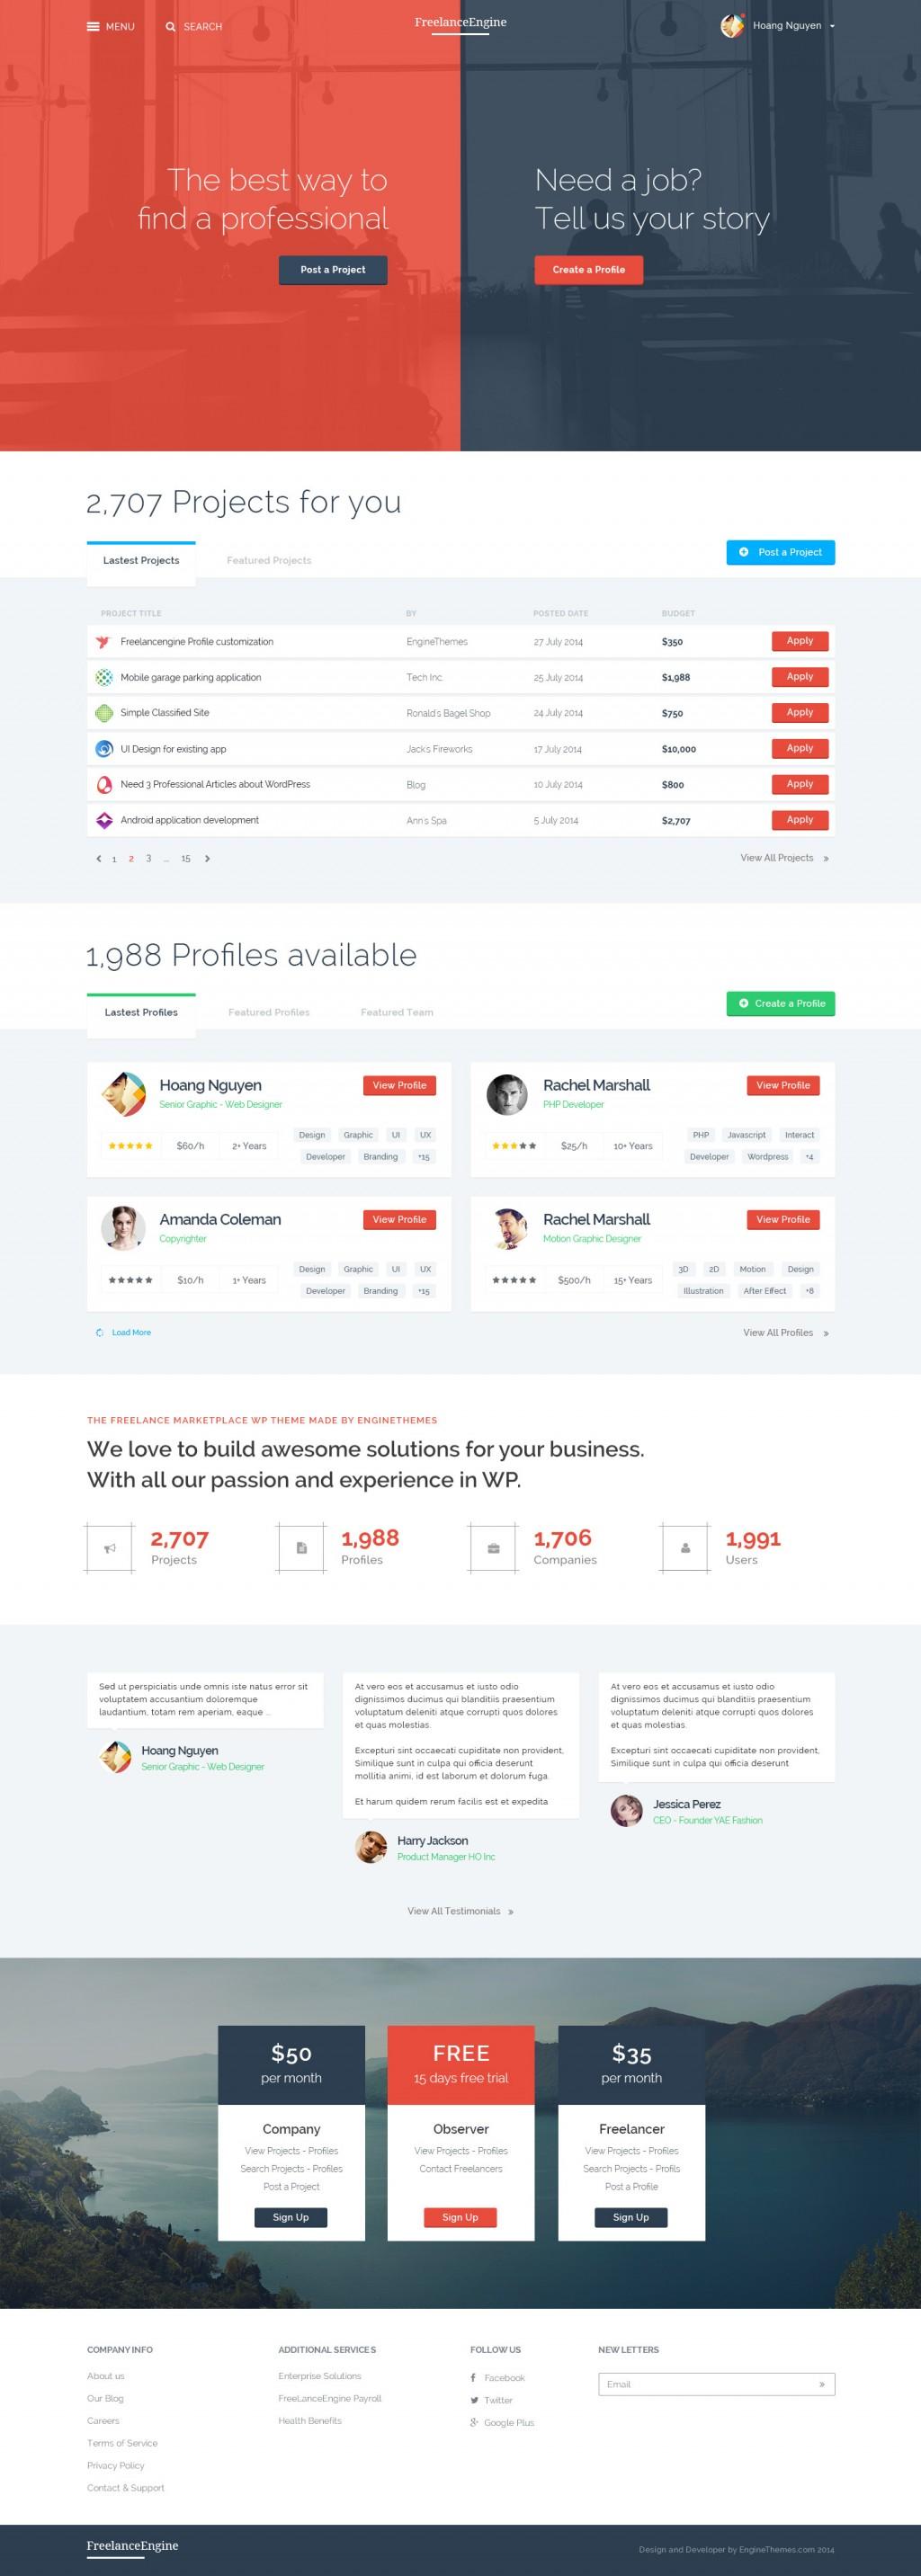 FreelanceEngine – Freelance Marketplace Template